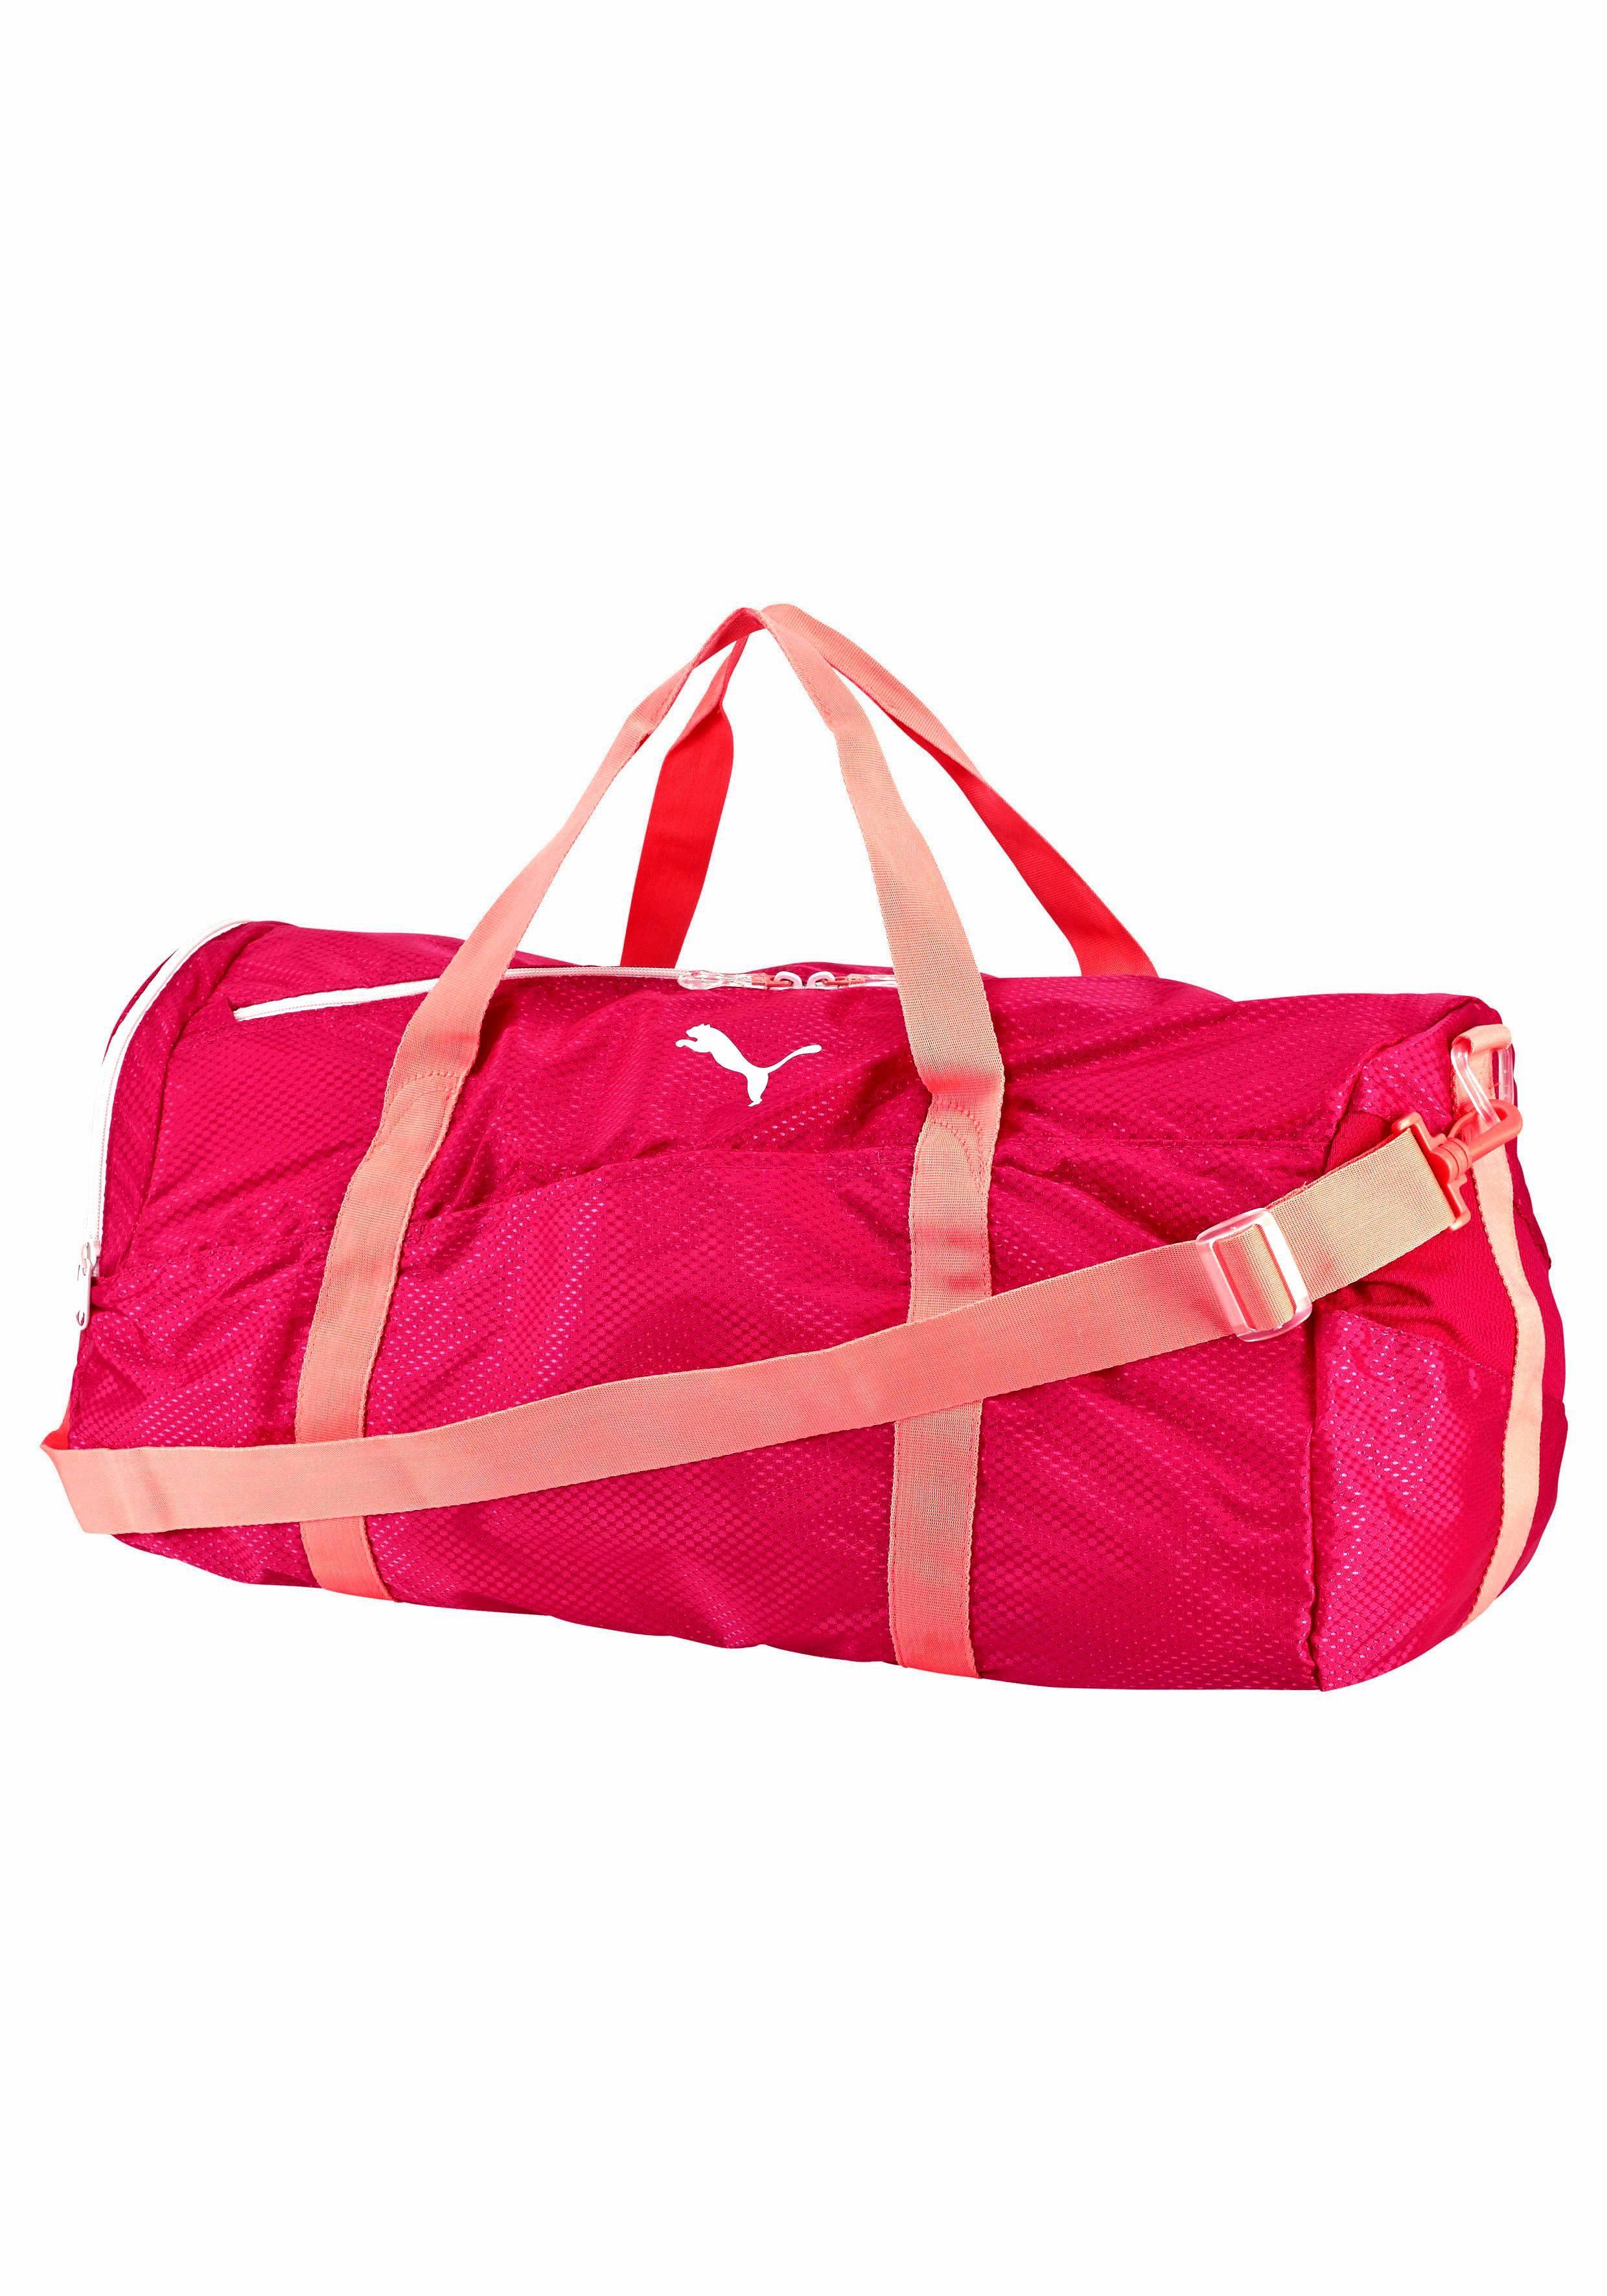 PUMA FIT AT LARGE SPORTS BAG Sporttasche